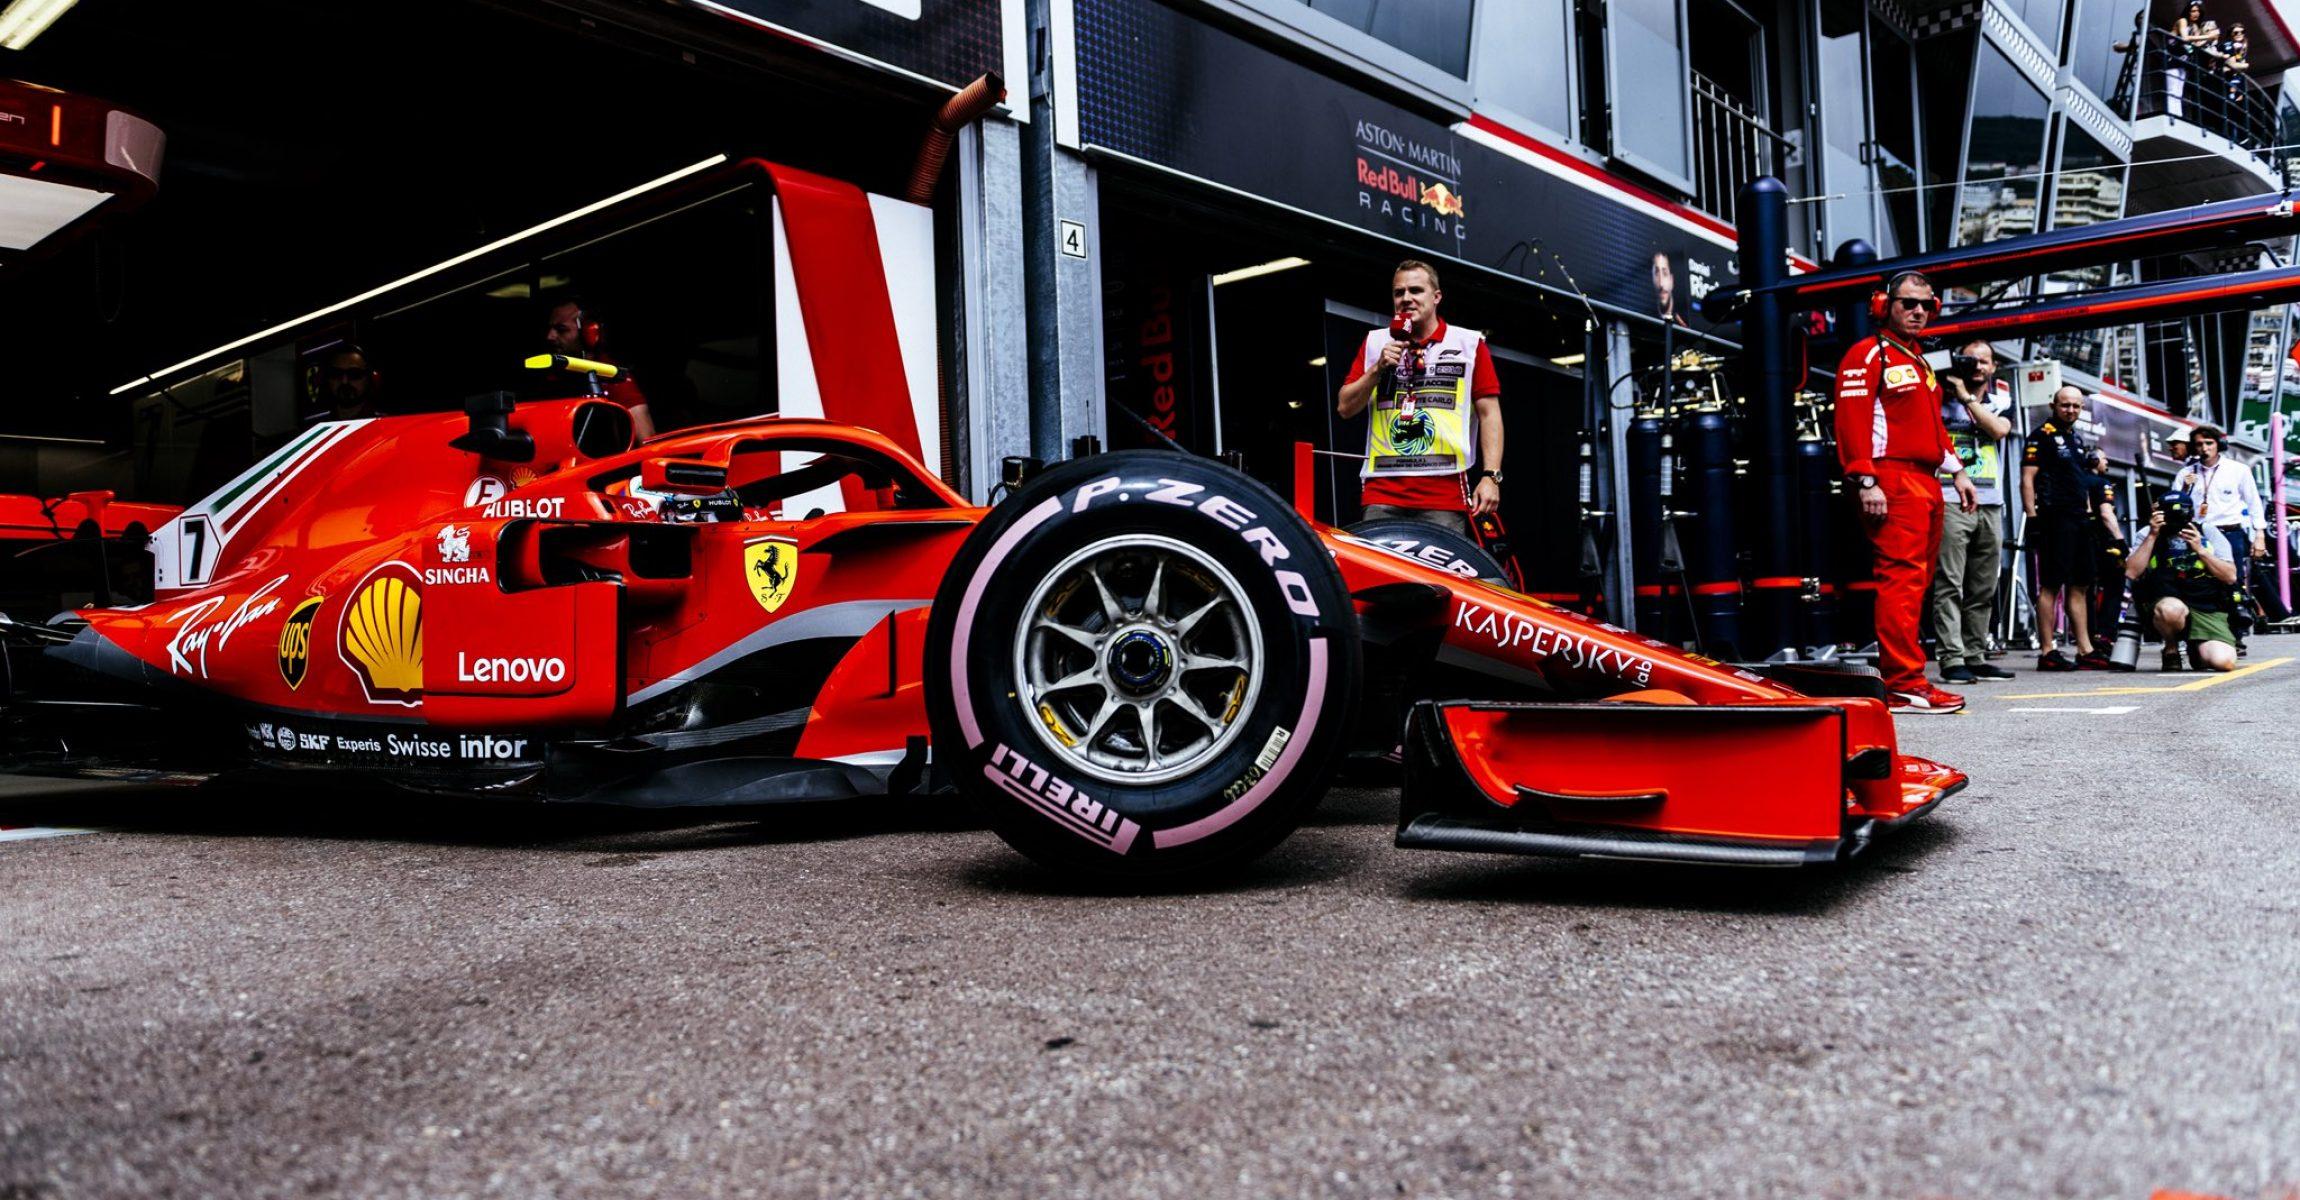 Fotó: Scuderia Ferrari